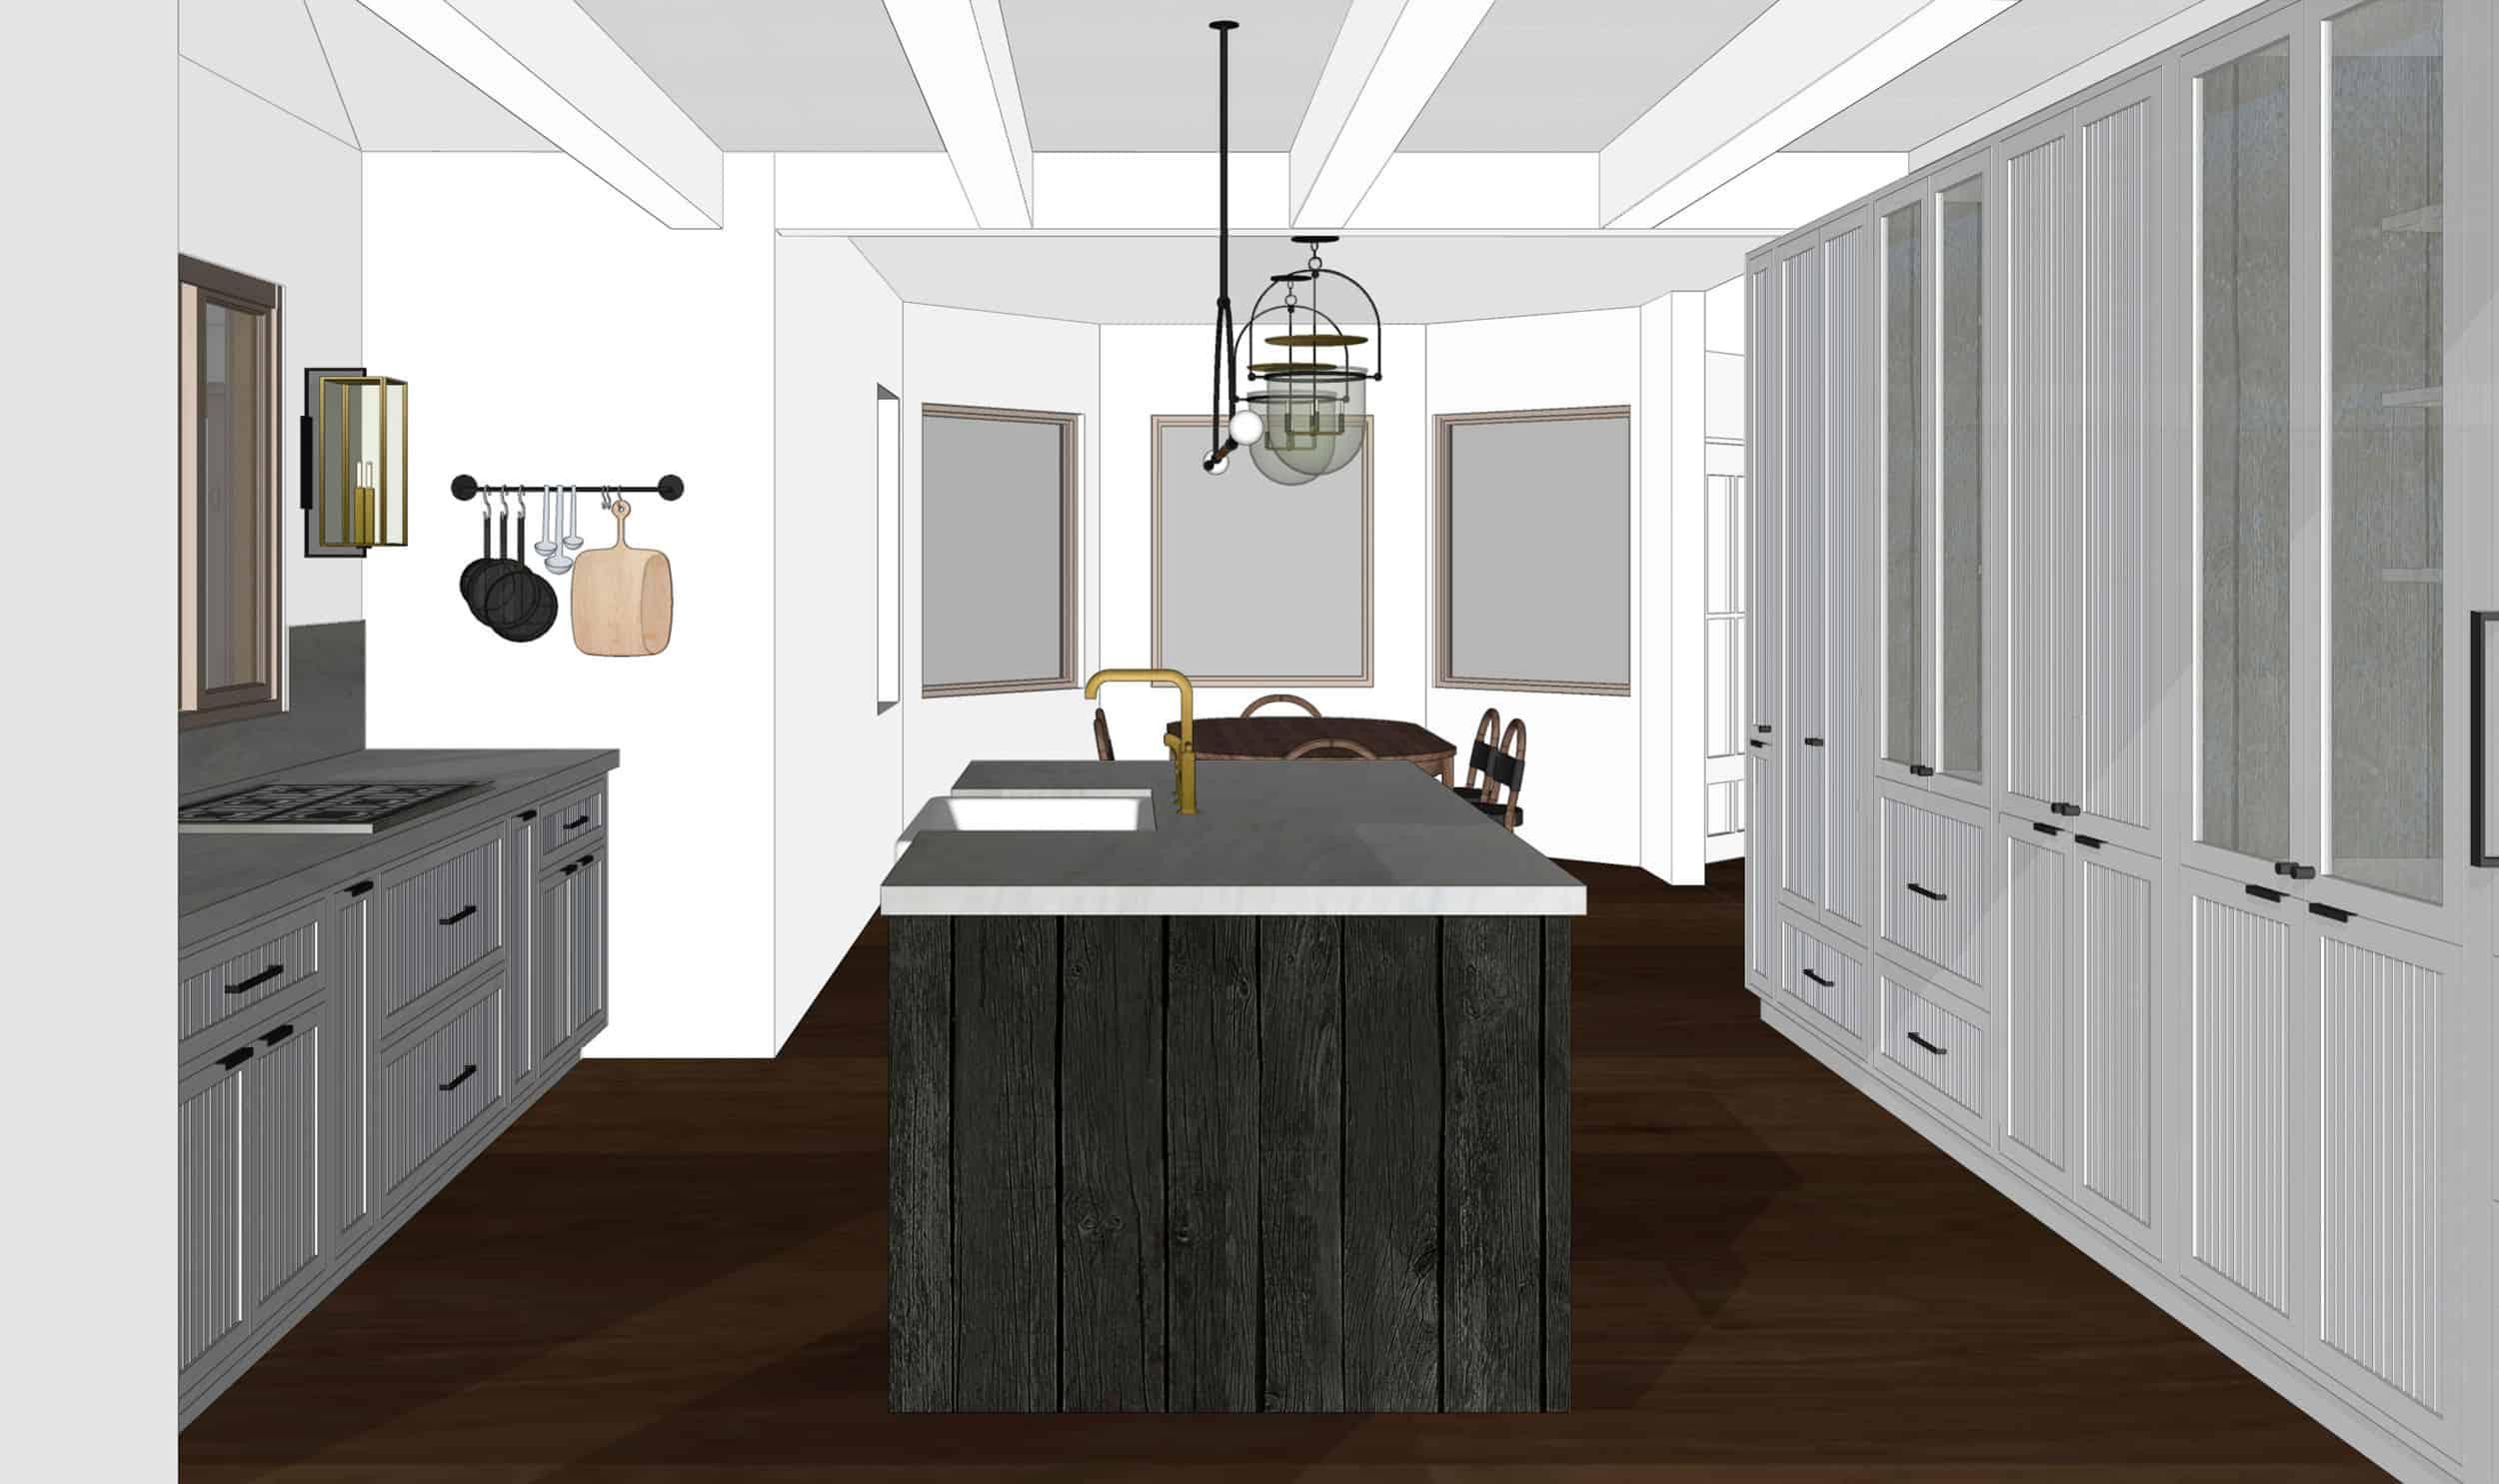 Emily Henderson Mountain Fixer Upper I Design You Decide Kitchen Render 02 Fnladj